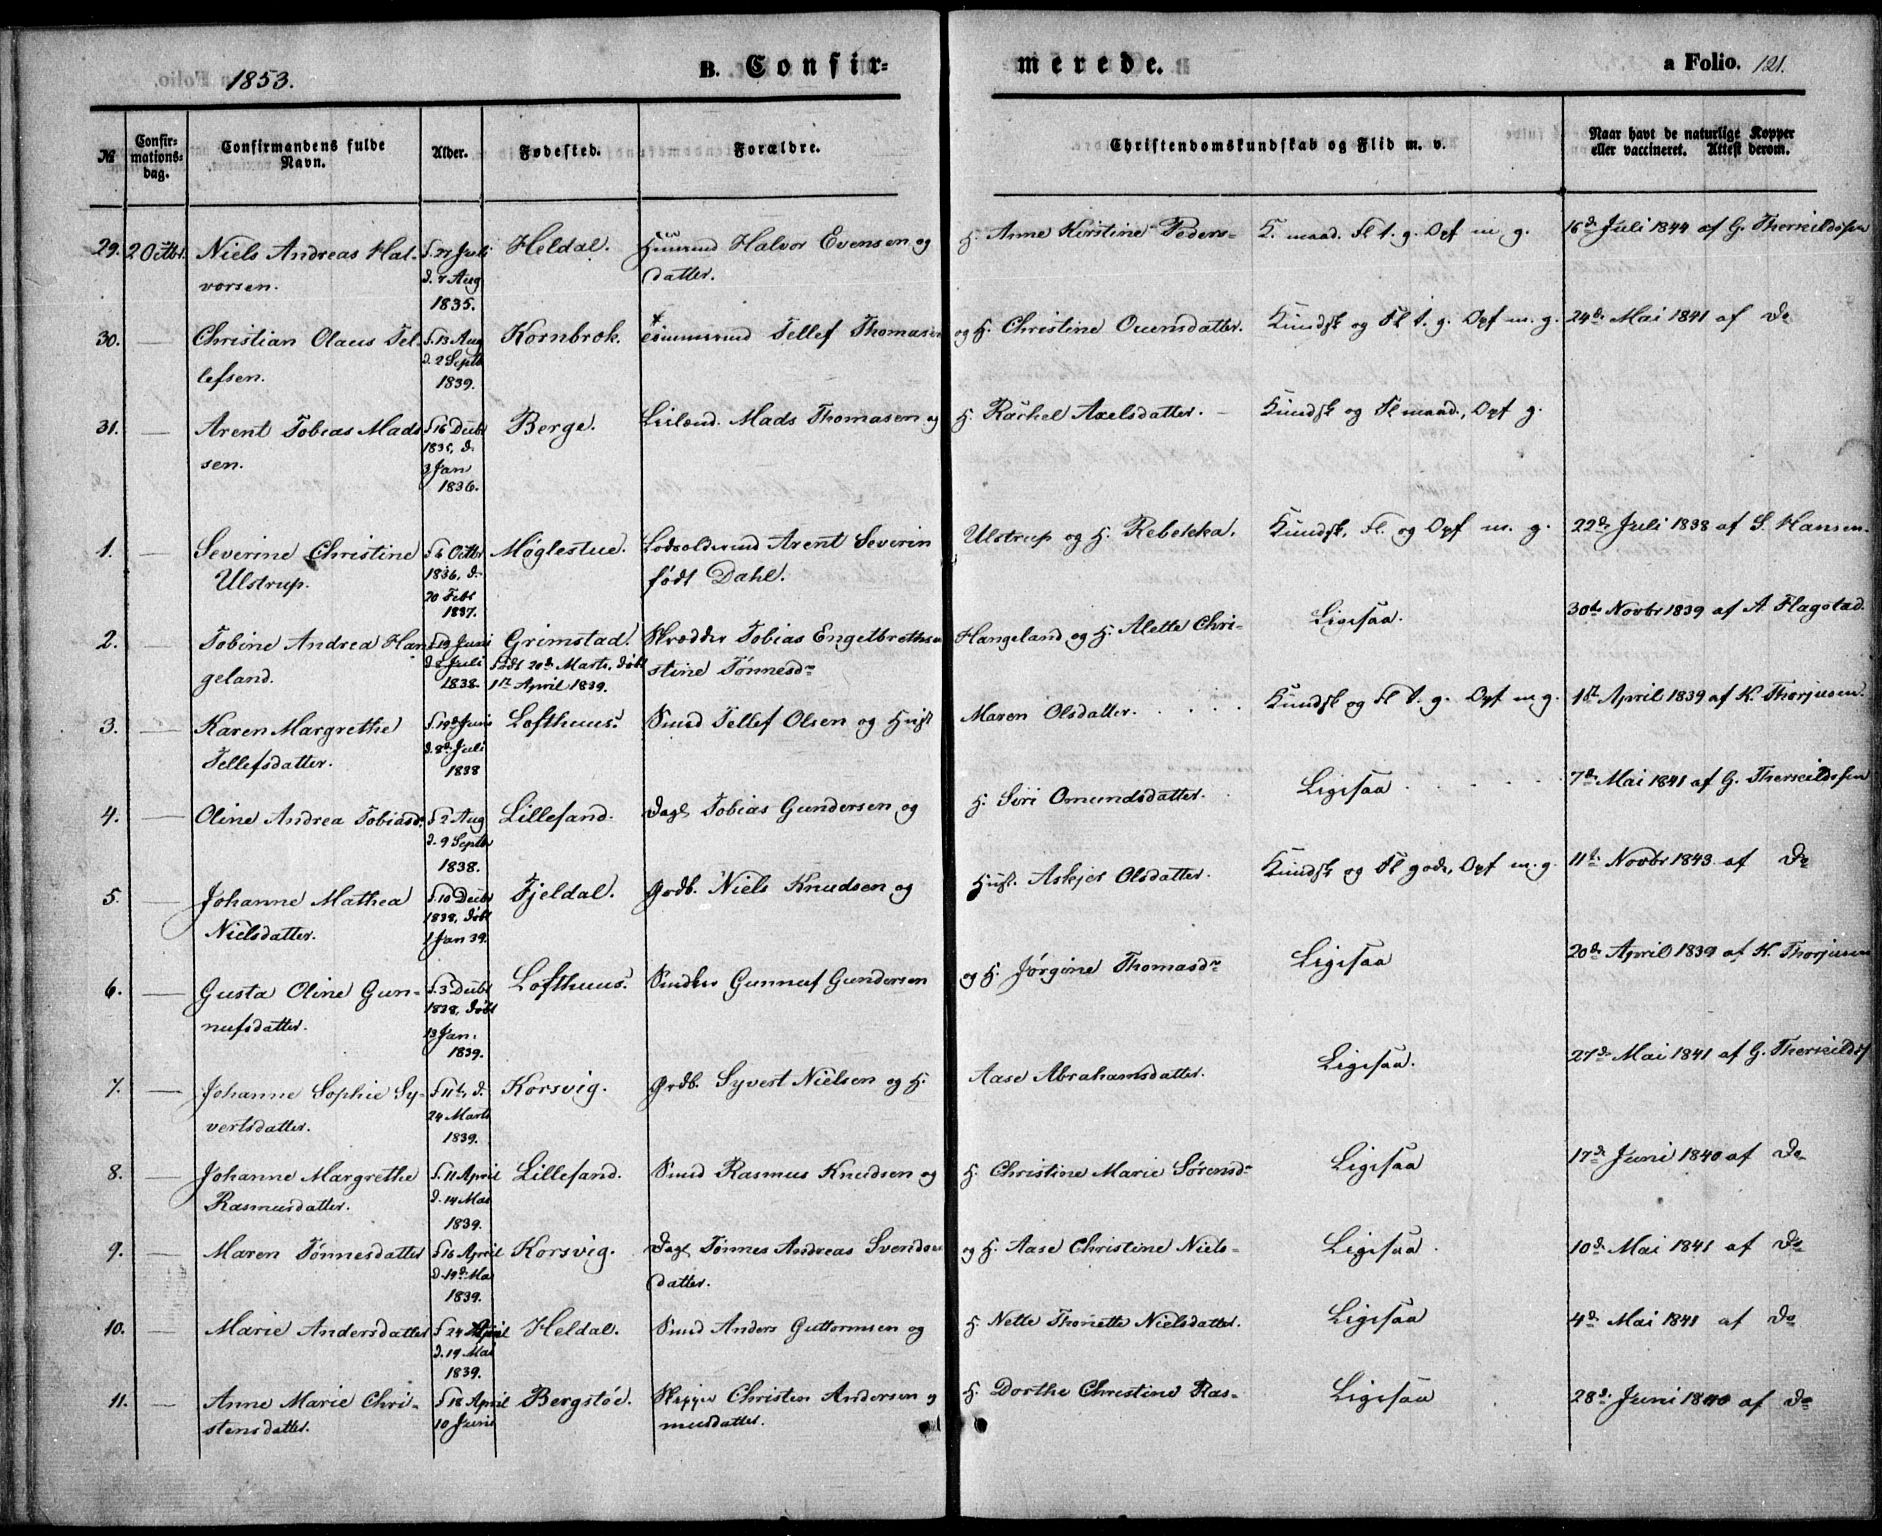 SAK, Vestre Moland sokneprestkontor, F/Fb/Fbb/L0003: Klokkerbok nr. B 3, 1851-1861, s. 121